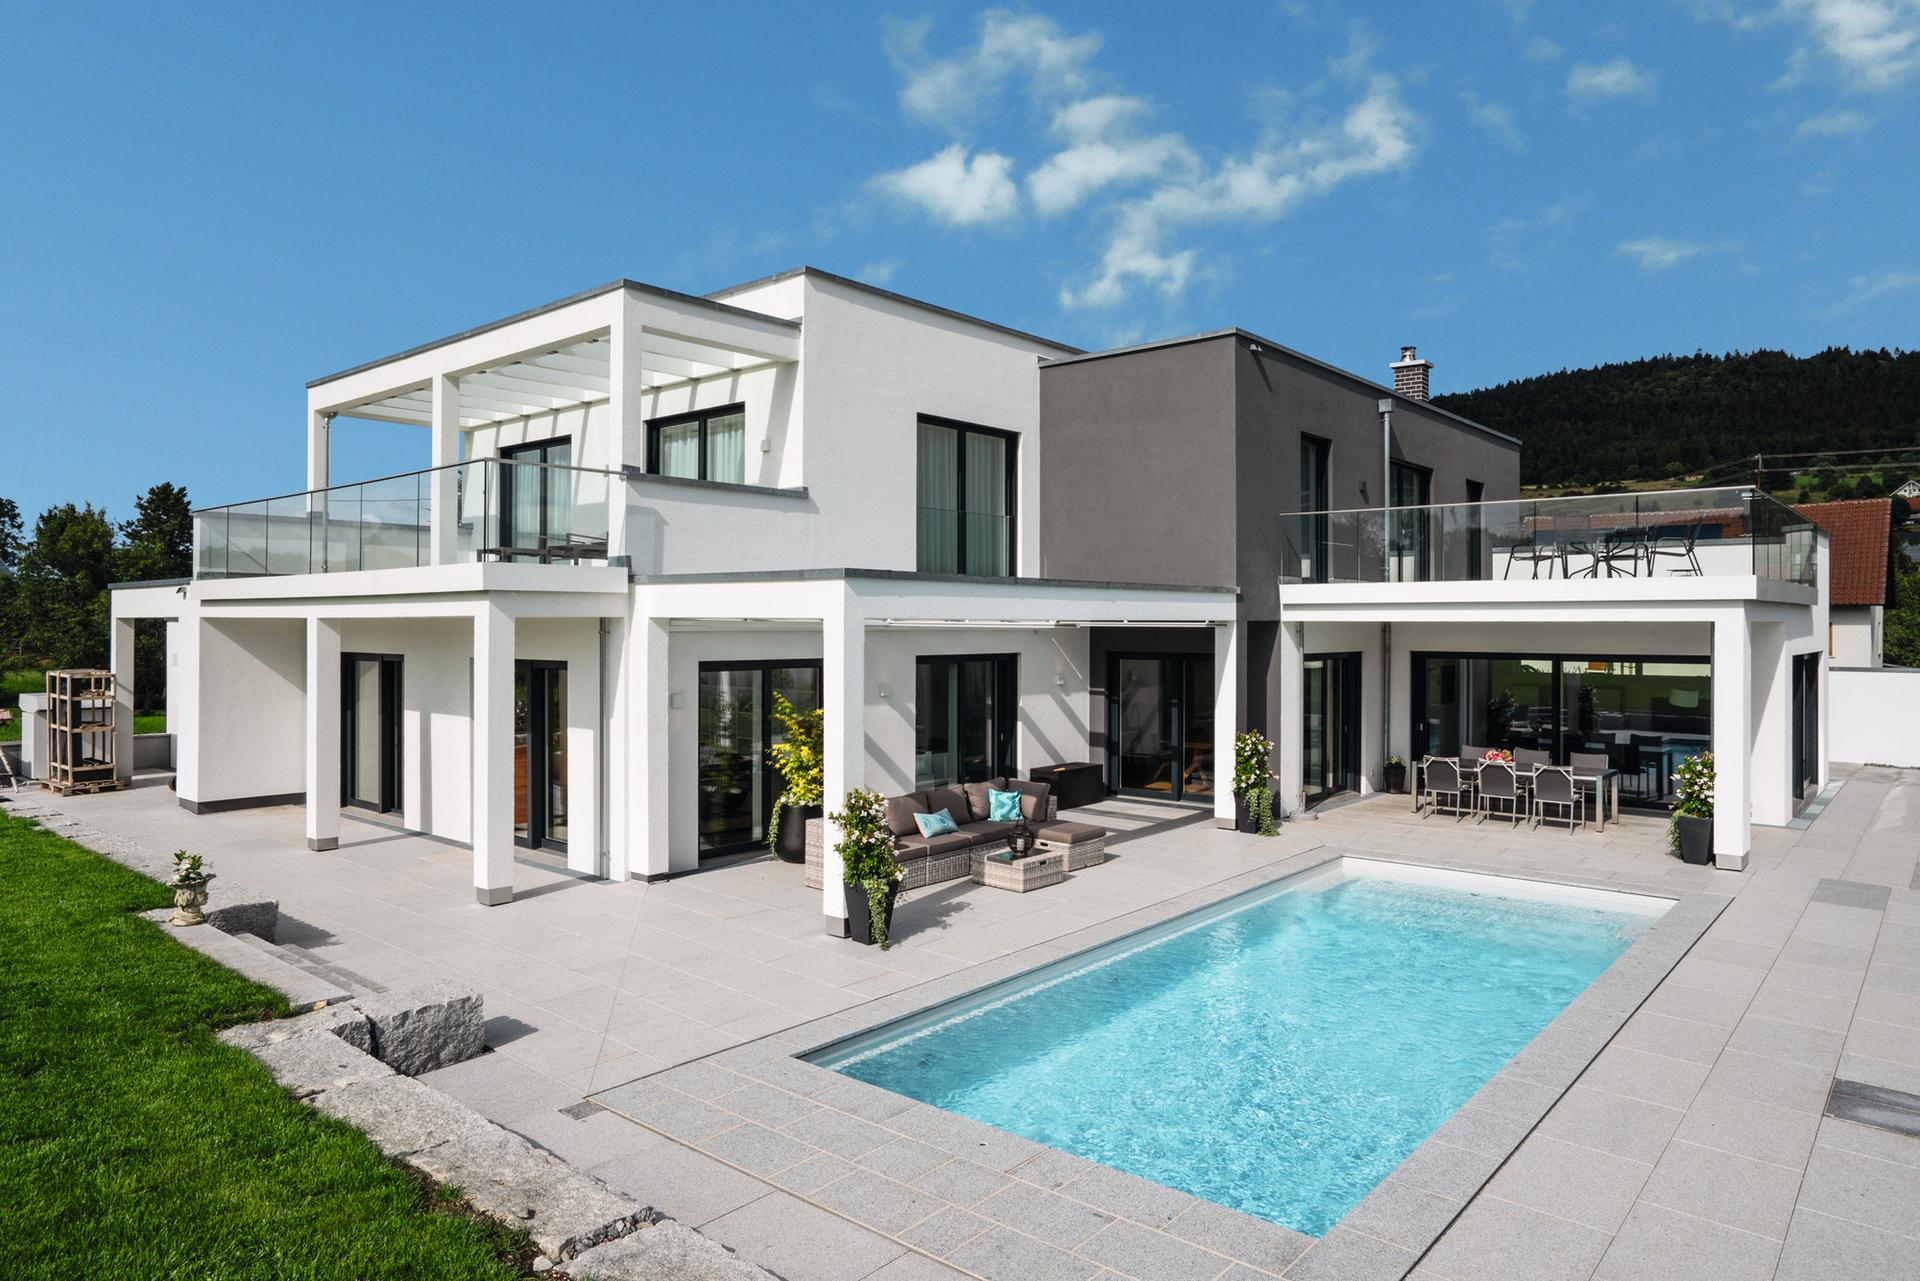 freigeplantes Einfamilienhaus in Fertigbauweise mit Pool